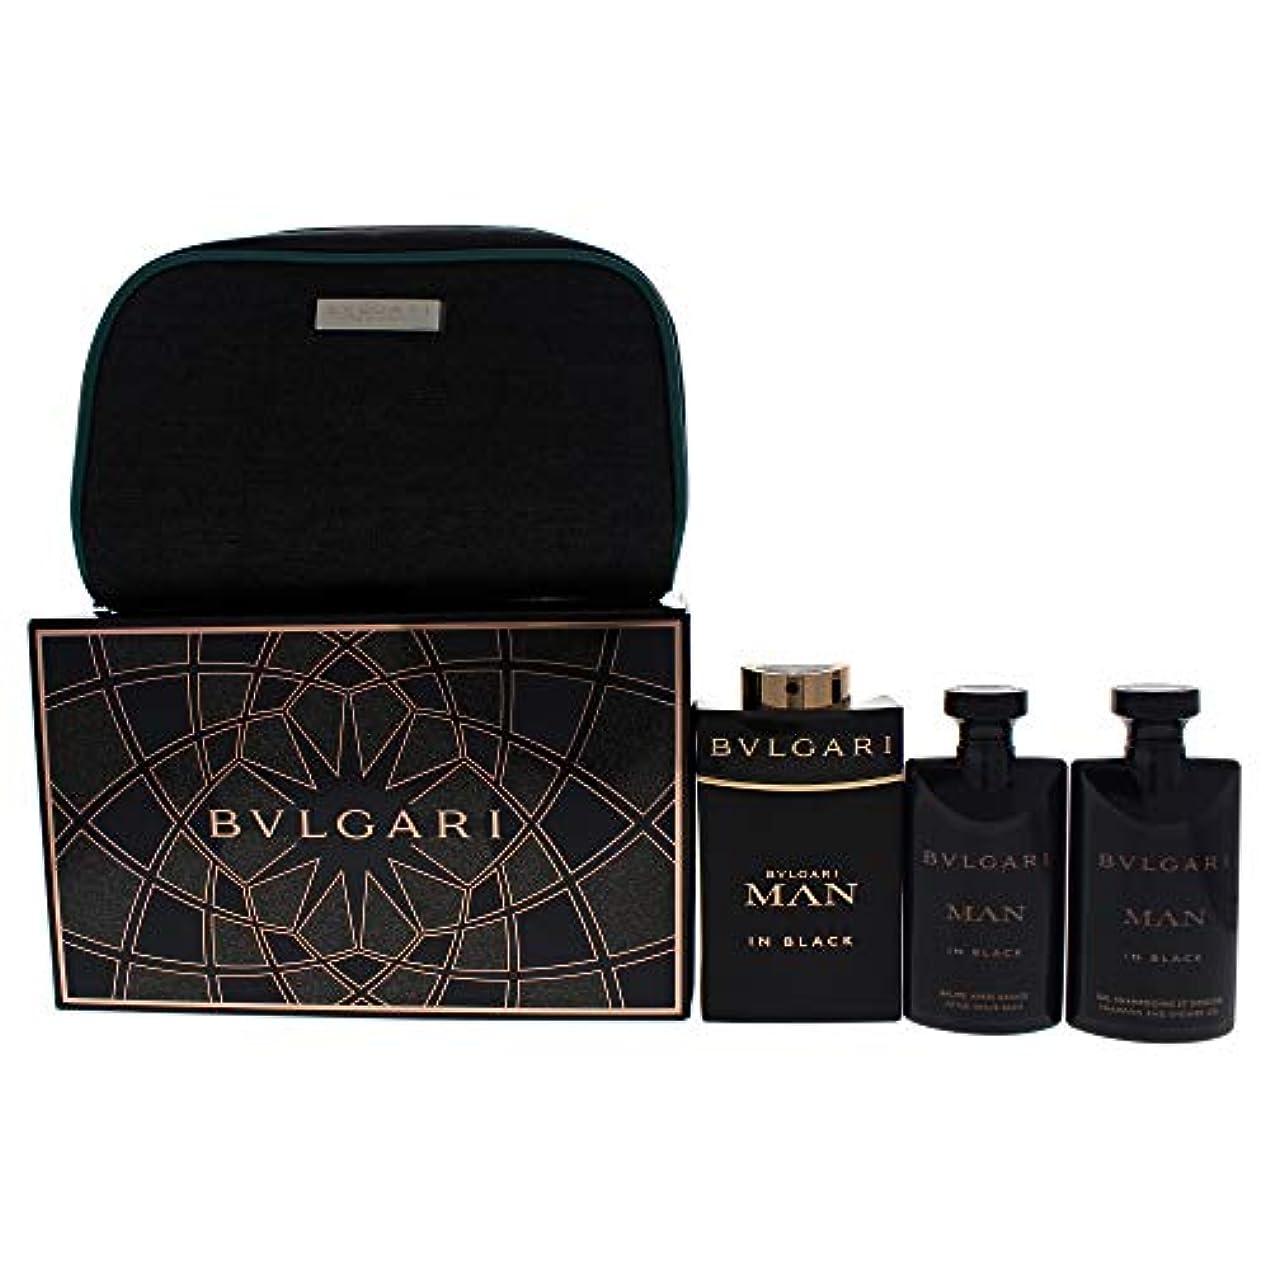 教室所有権大工Bvlgari Man In Black Eau De Parfum 100Ml Vaporizador + Gel De Baño 75Ml + After Shave Balm 75Ml